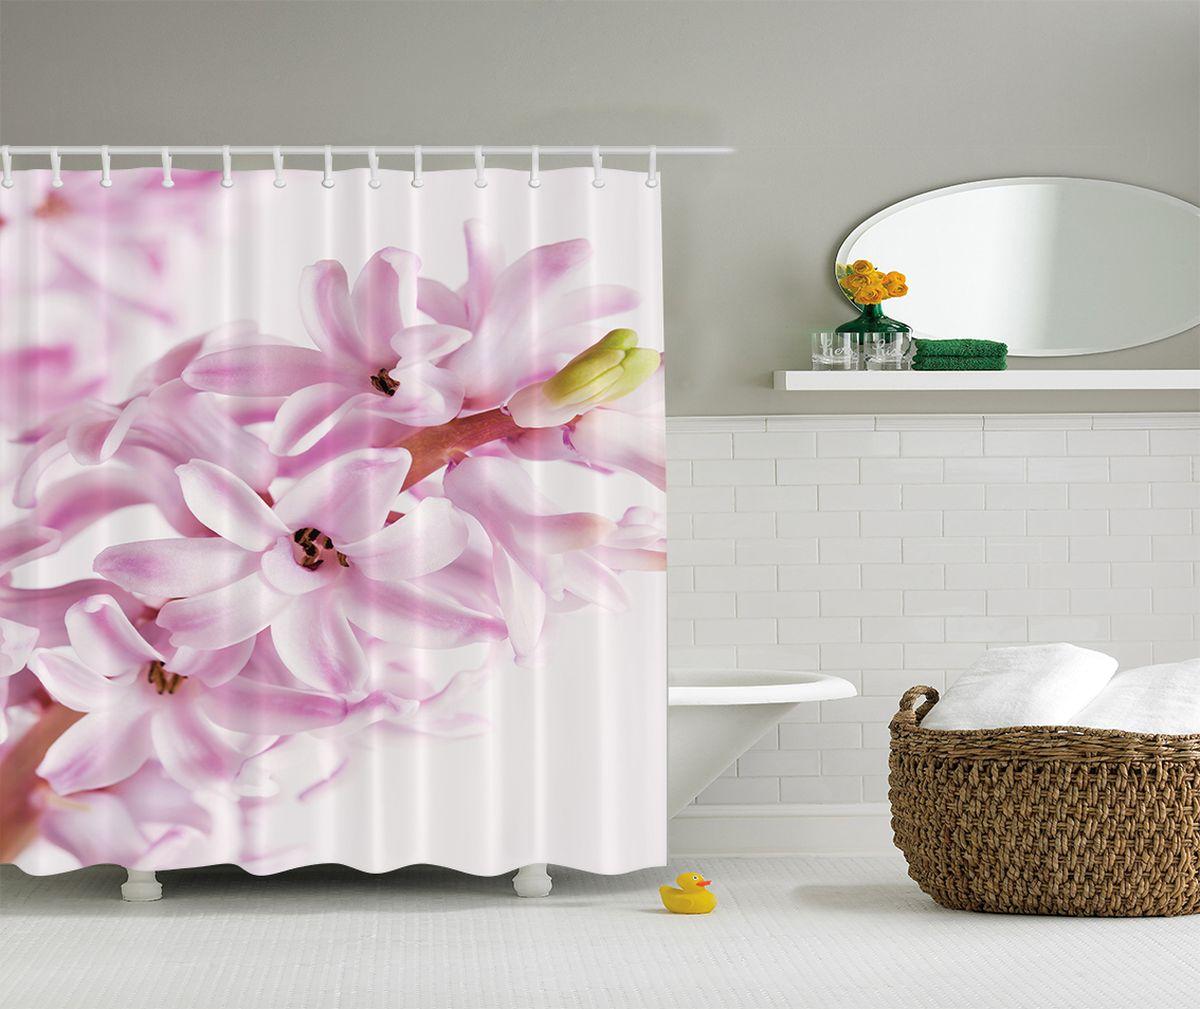 Штора для ванной комнаты Magic Lady Гиацинт, 180 х 200 см штора для ванной комнаты magic lady разноцветные бабочки 180 х 200 см